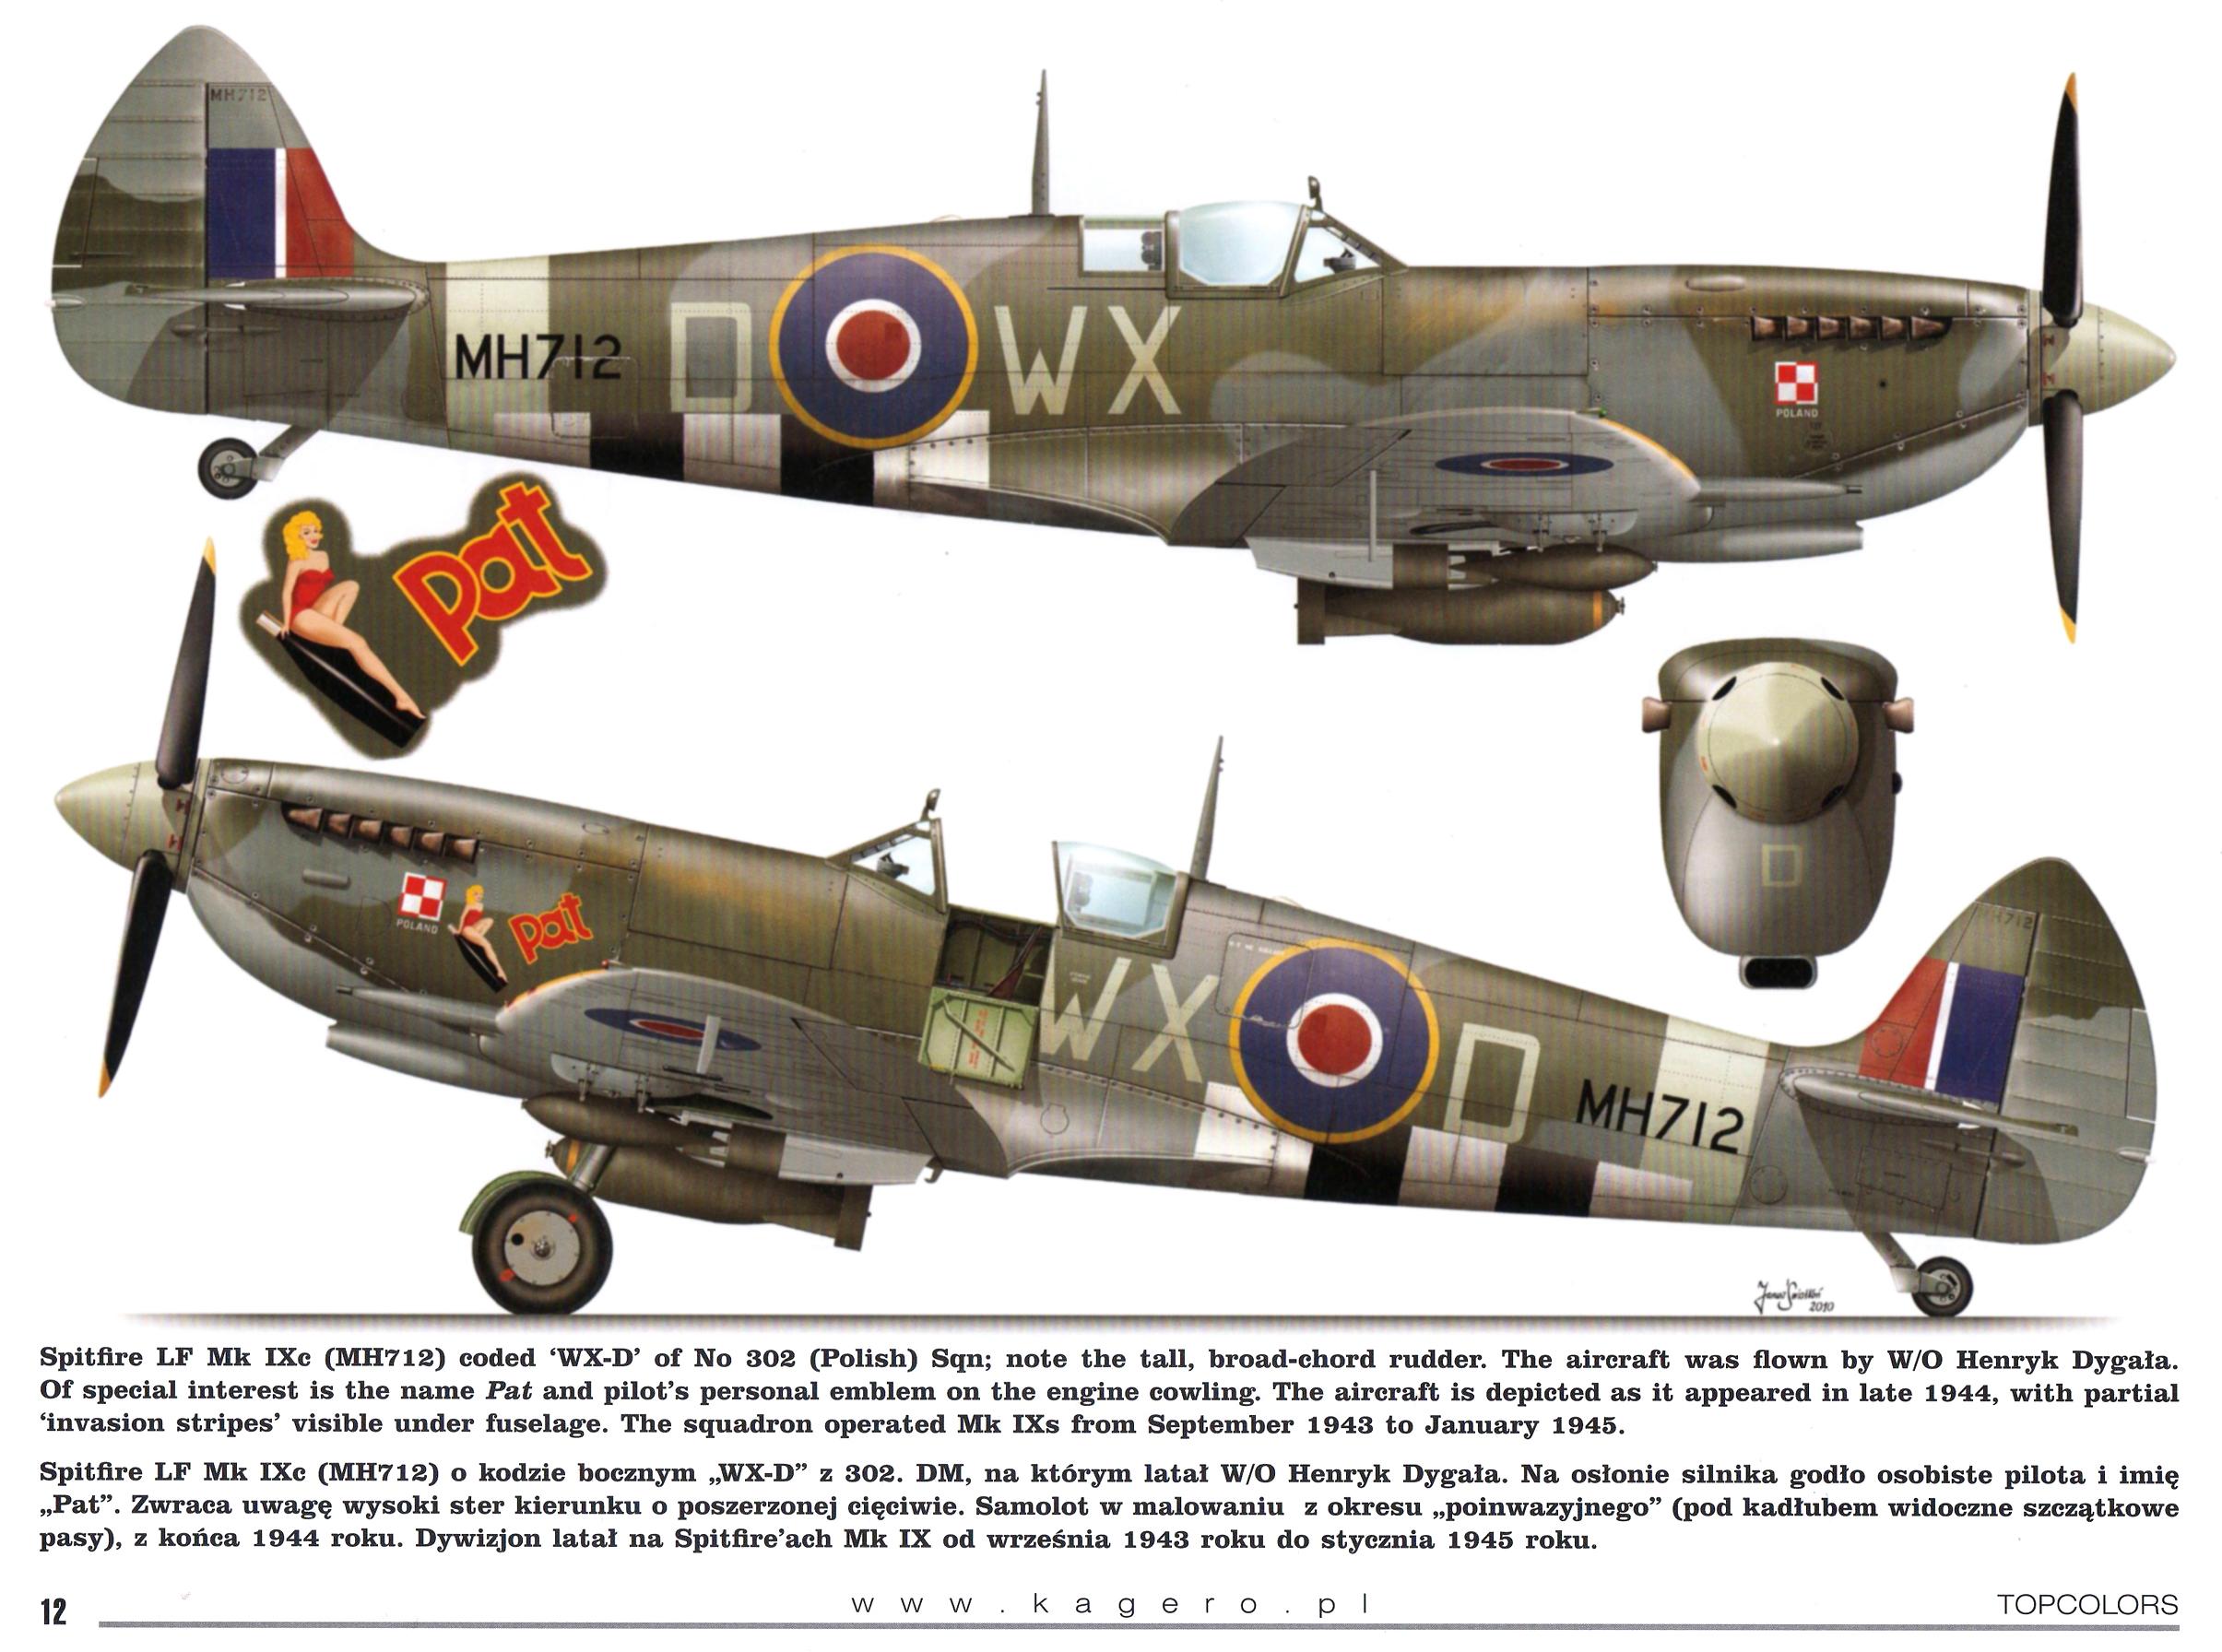 Spitfire MkIXc RAF 302Sqn WXD MH712 TC15015 Supermarine Spitfire MkIX Page 12